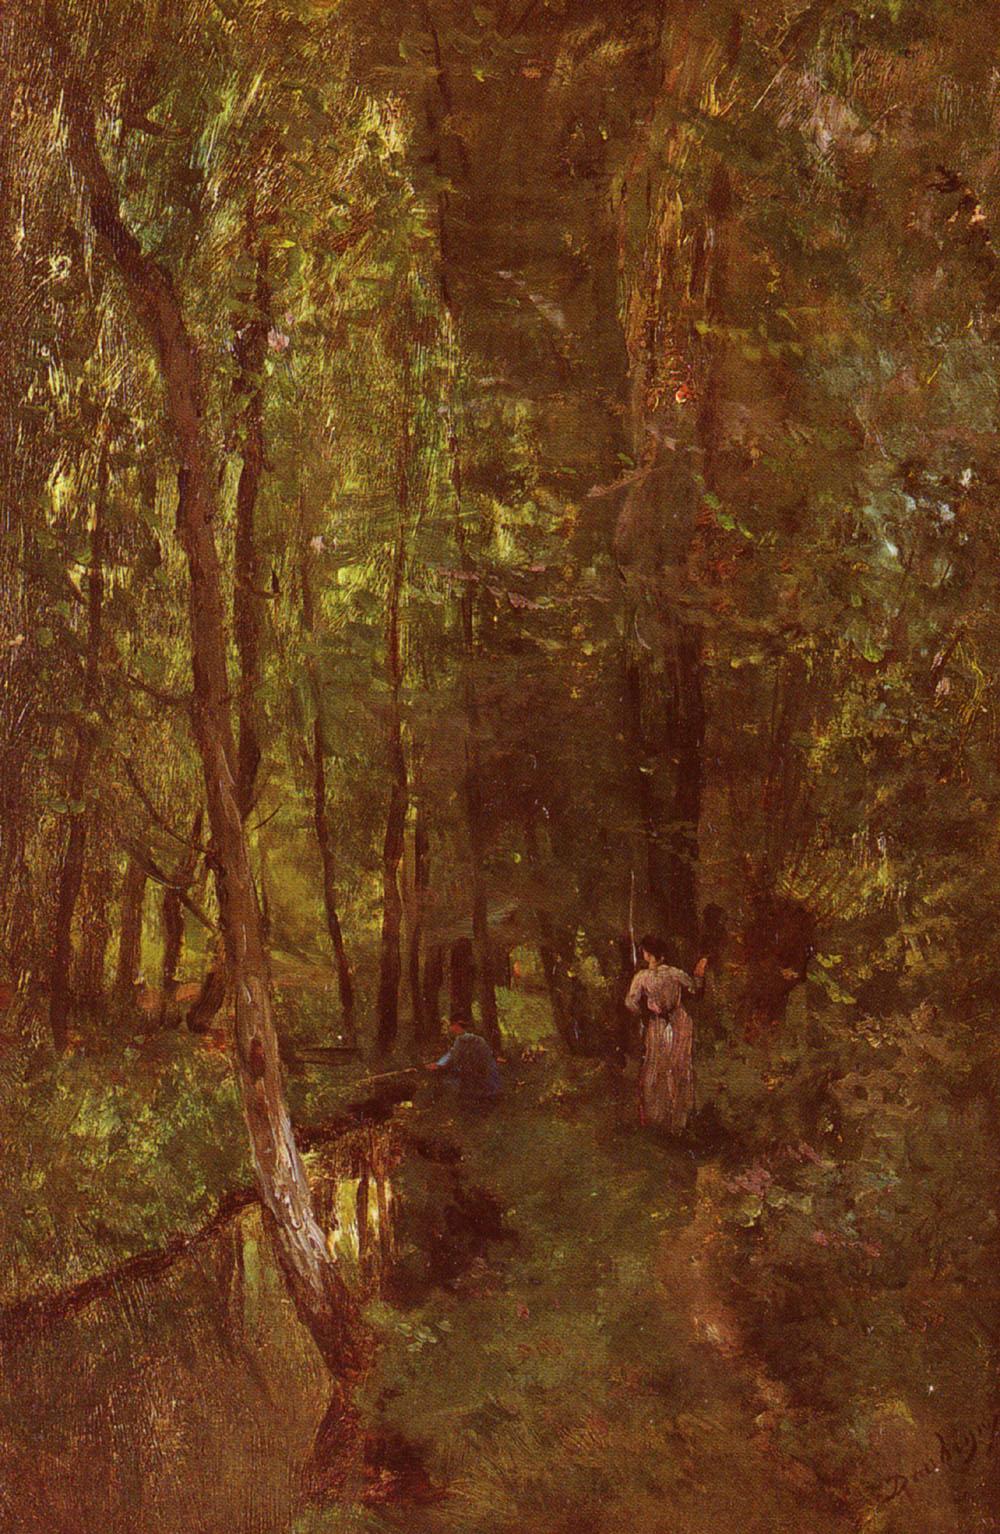 Daubigny Charles Francois Le Ru De Valmondois | Charles Francois Daubigny | Oil Painting